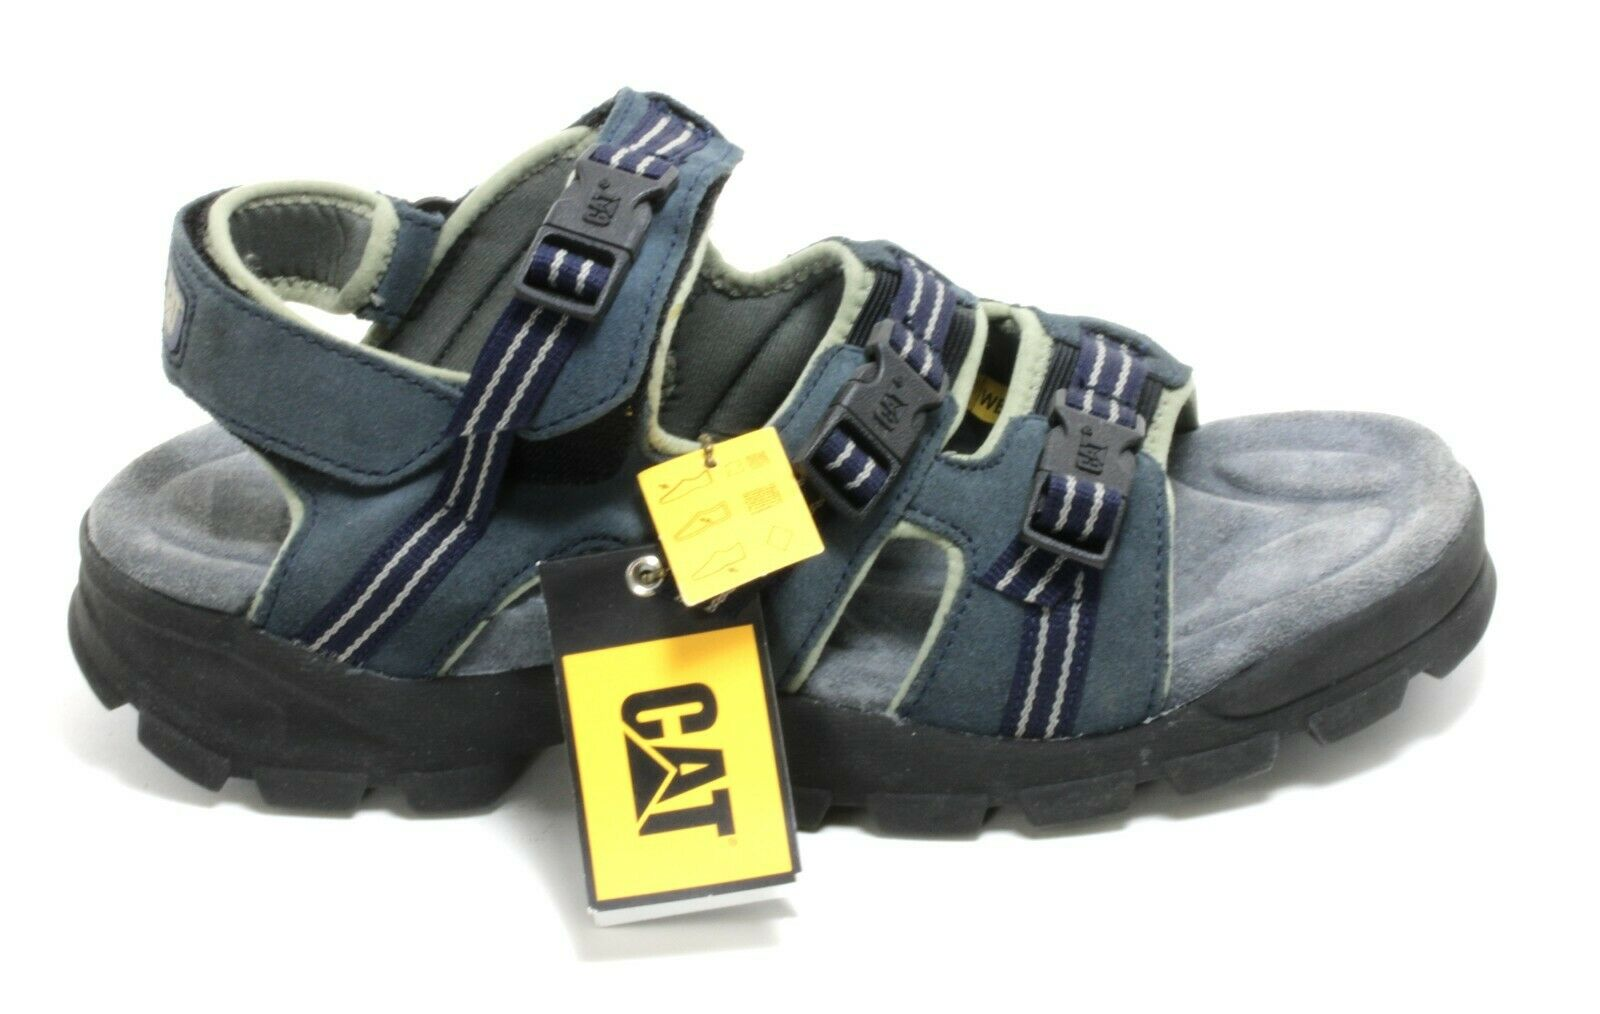 705 Sandal Trekking Touch Fastener Outdoor Shoes Summer Leather Caterpillar 45